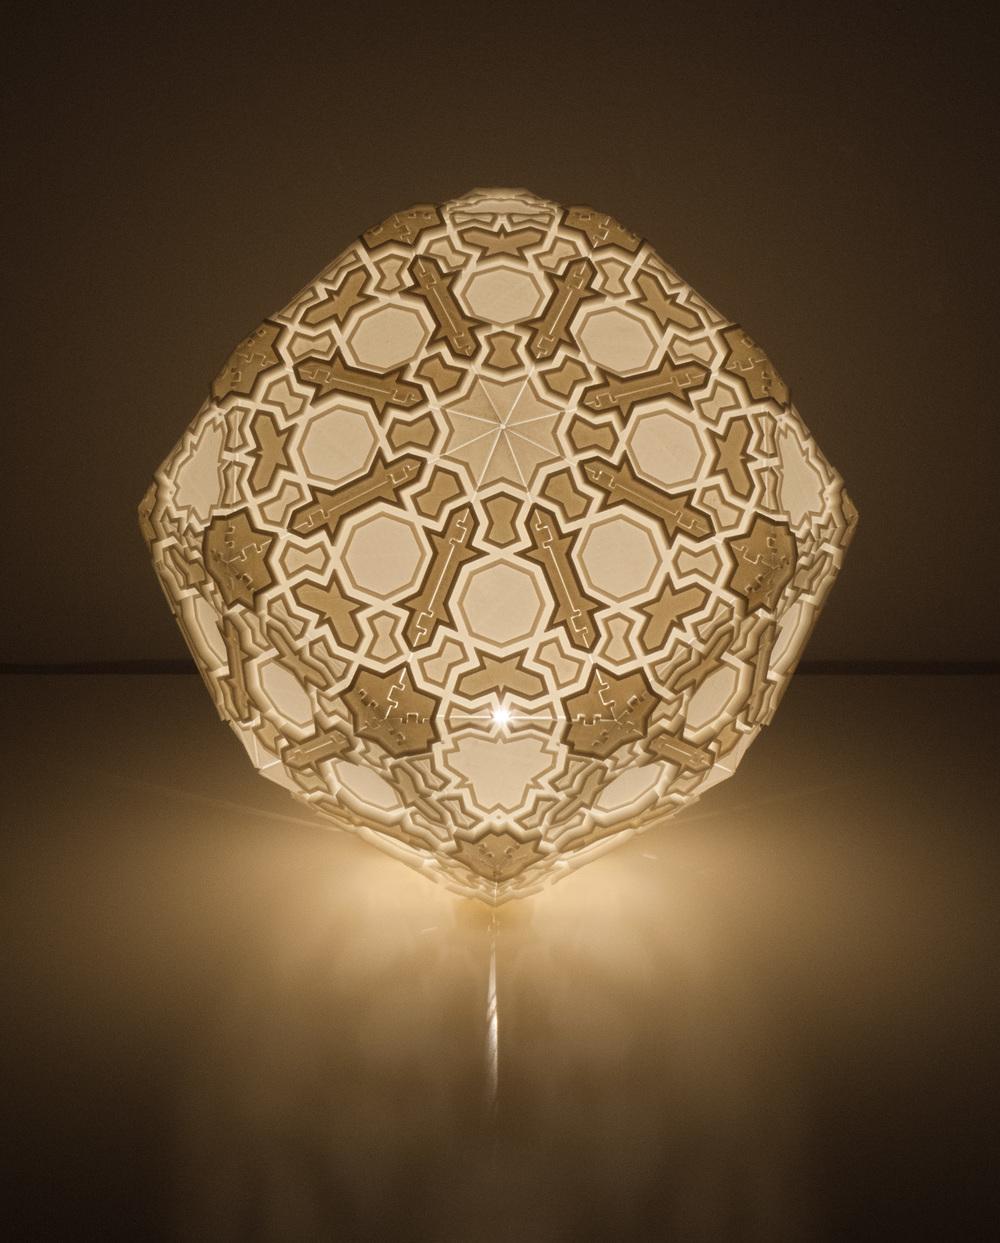 Artist Creates Breathtaking 3D Printed Lamps